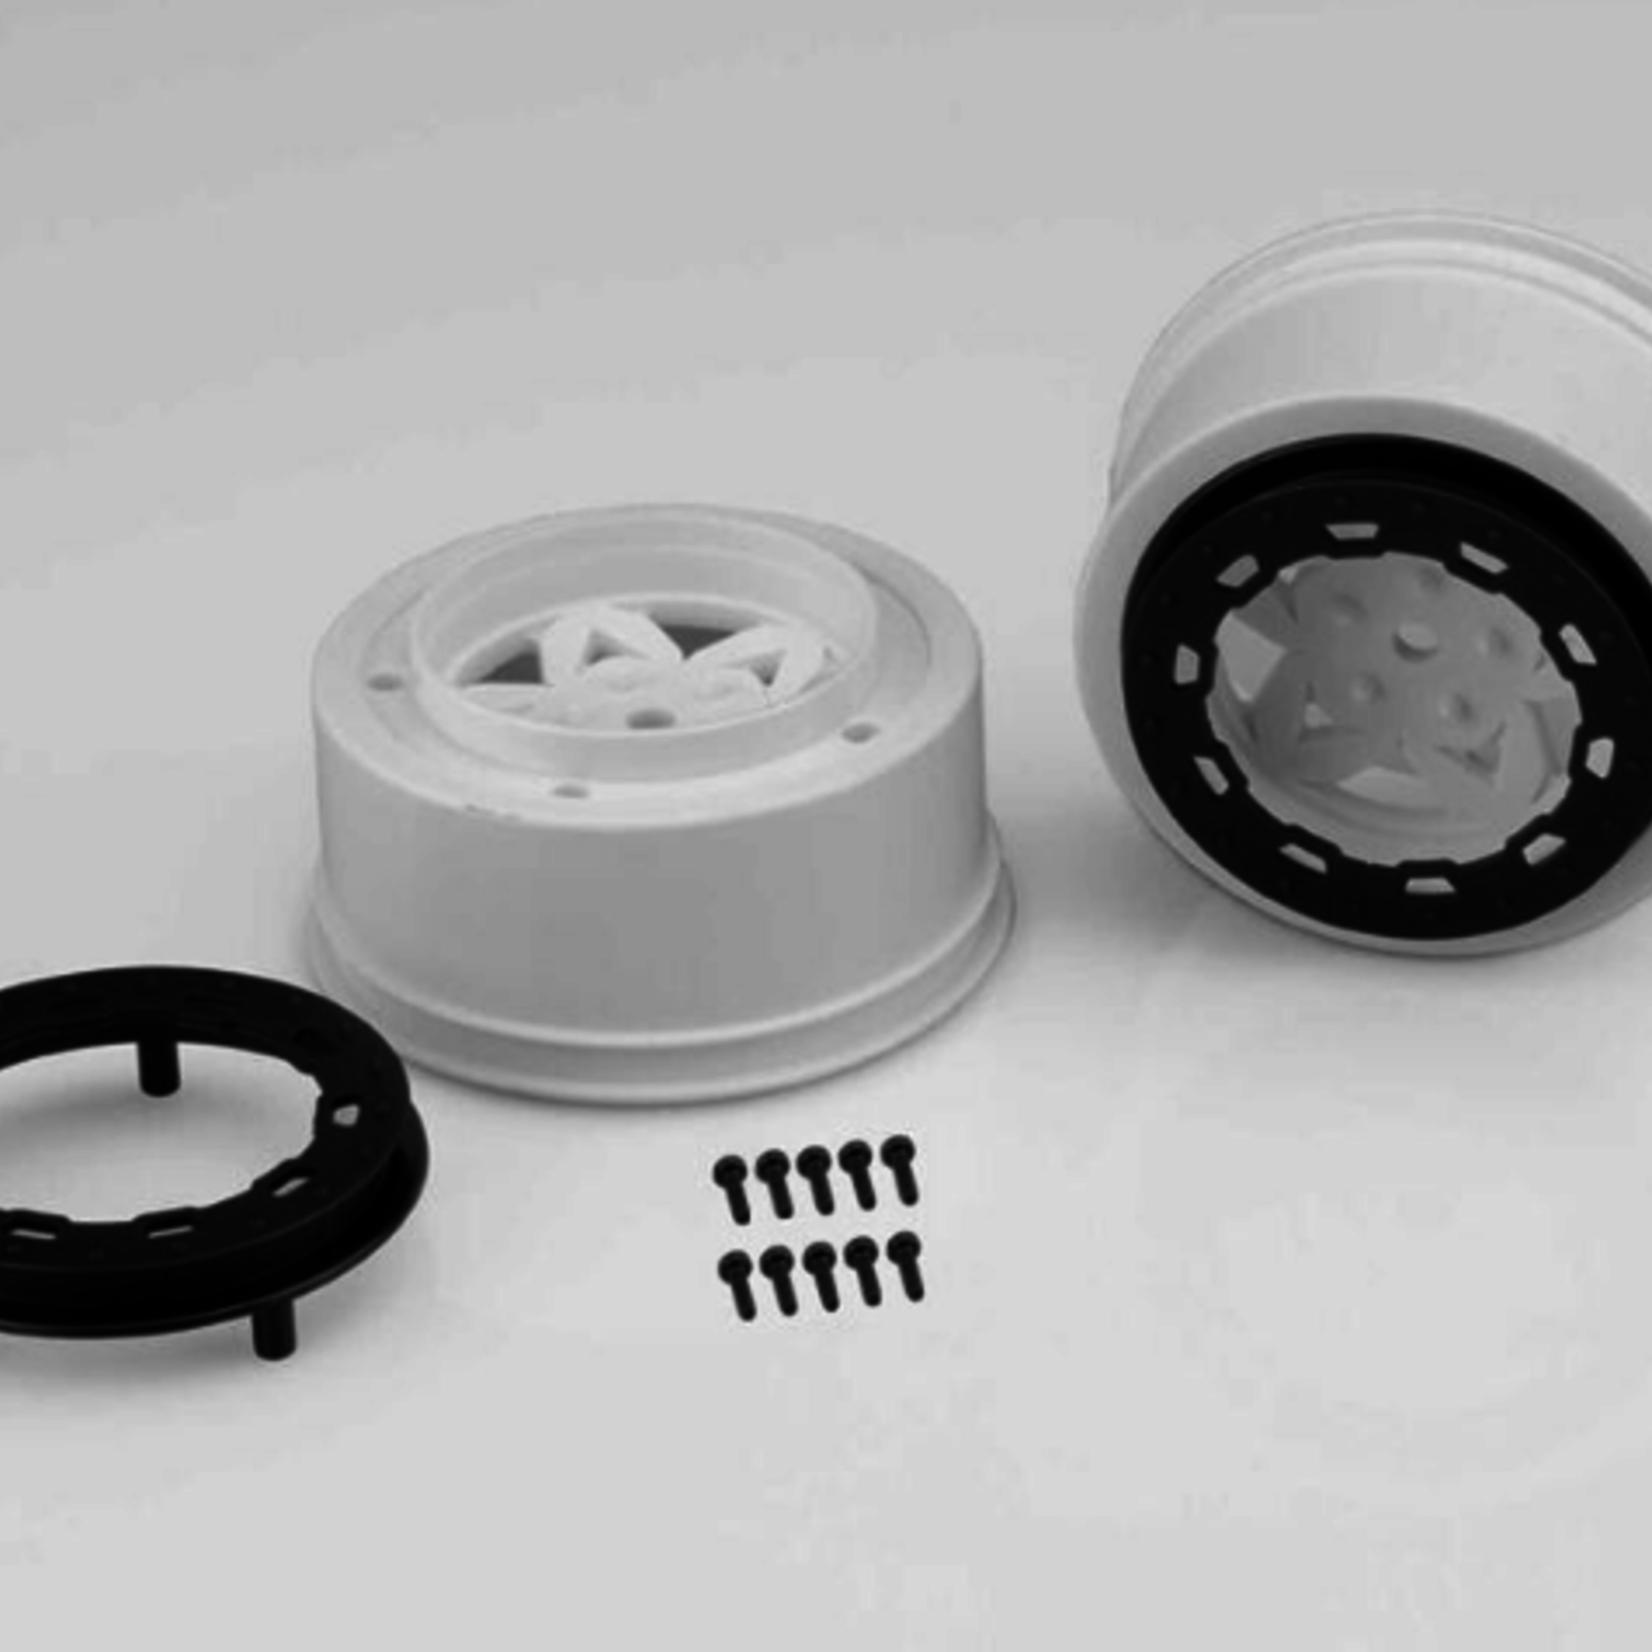 JConcepts JCO3391WB JConcepts Tremor SLH Rr/SLH 4x4 F/R wheel-WHT/BLK BDLCK (2)